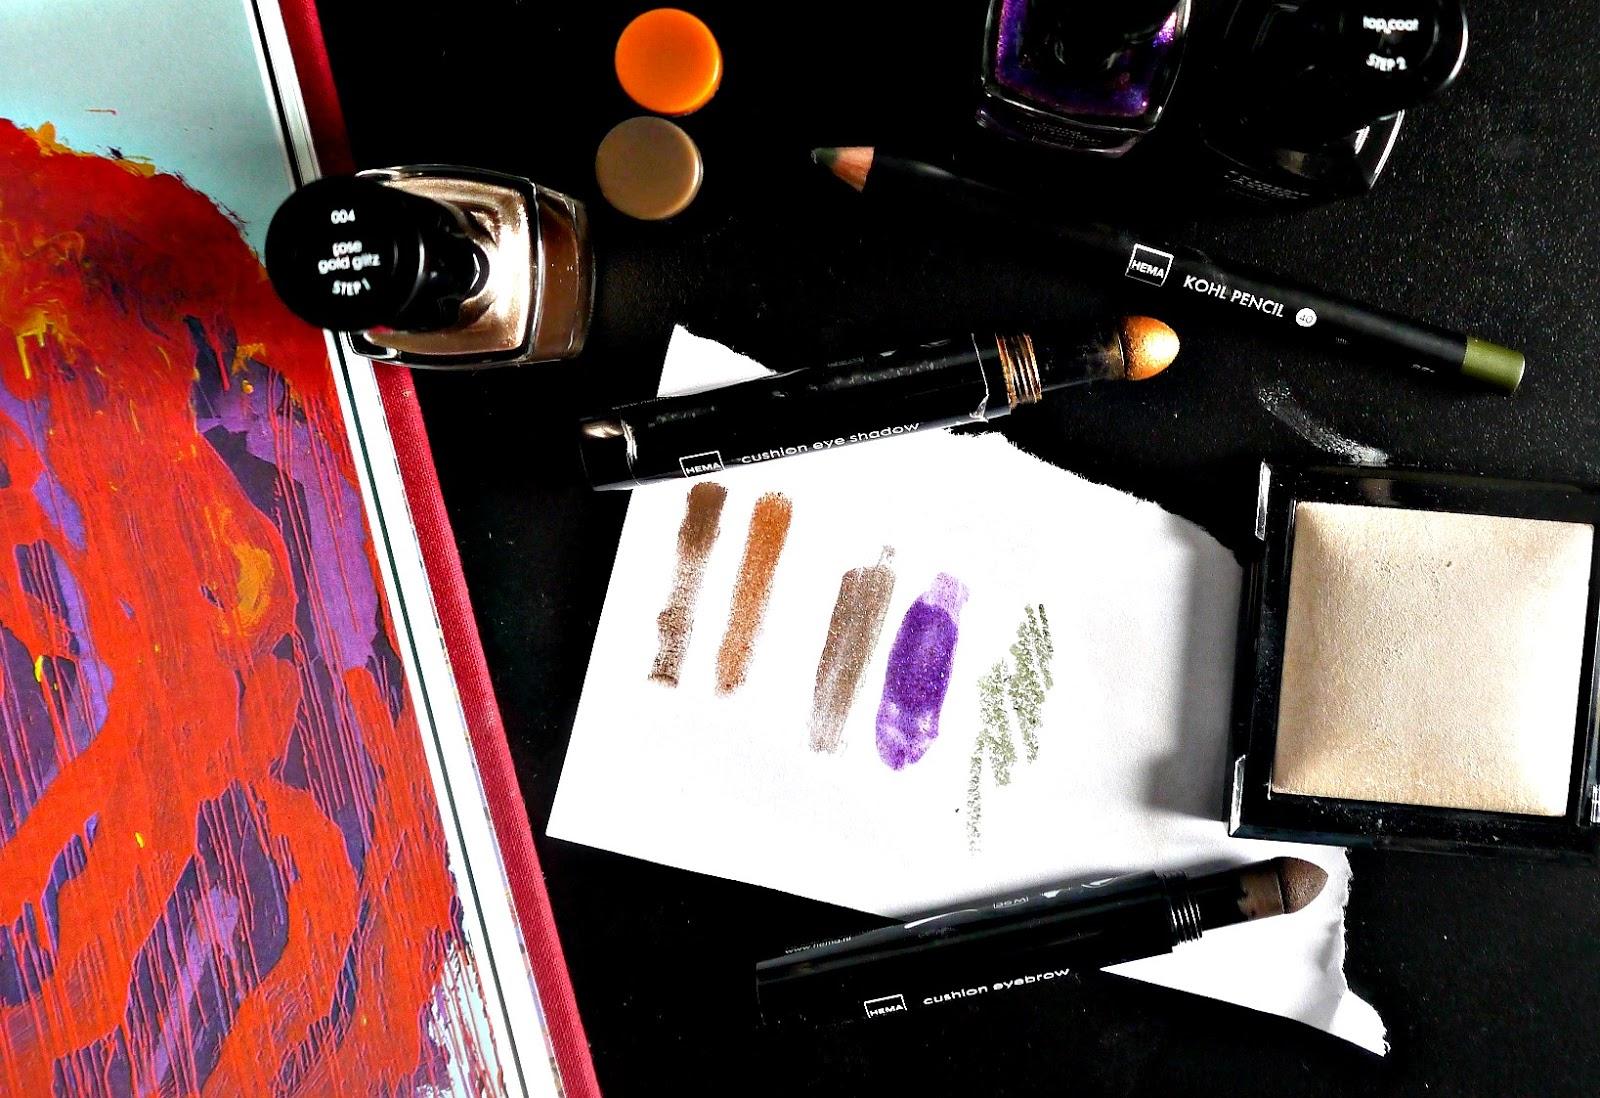 What's good from HEMA cosmetics? // HEMA stores makeup